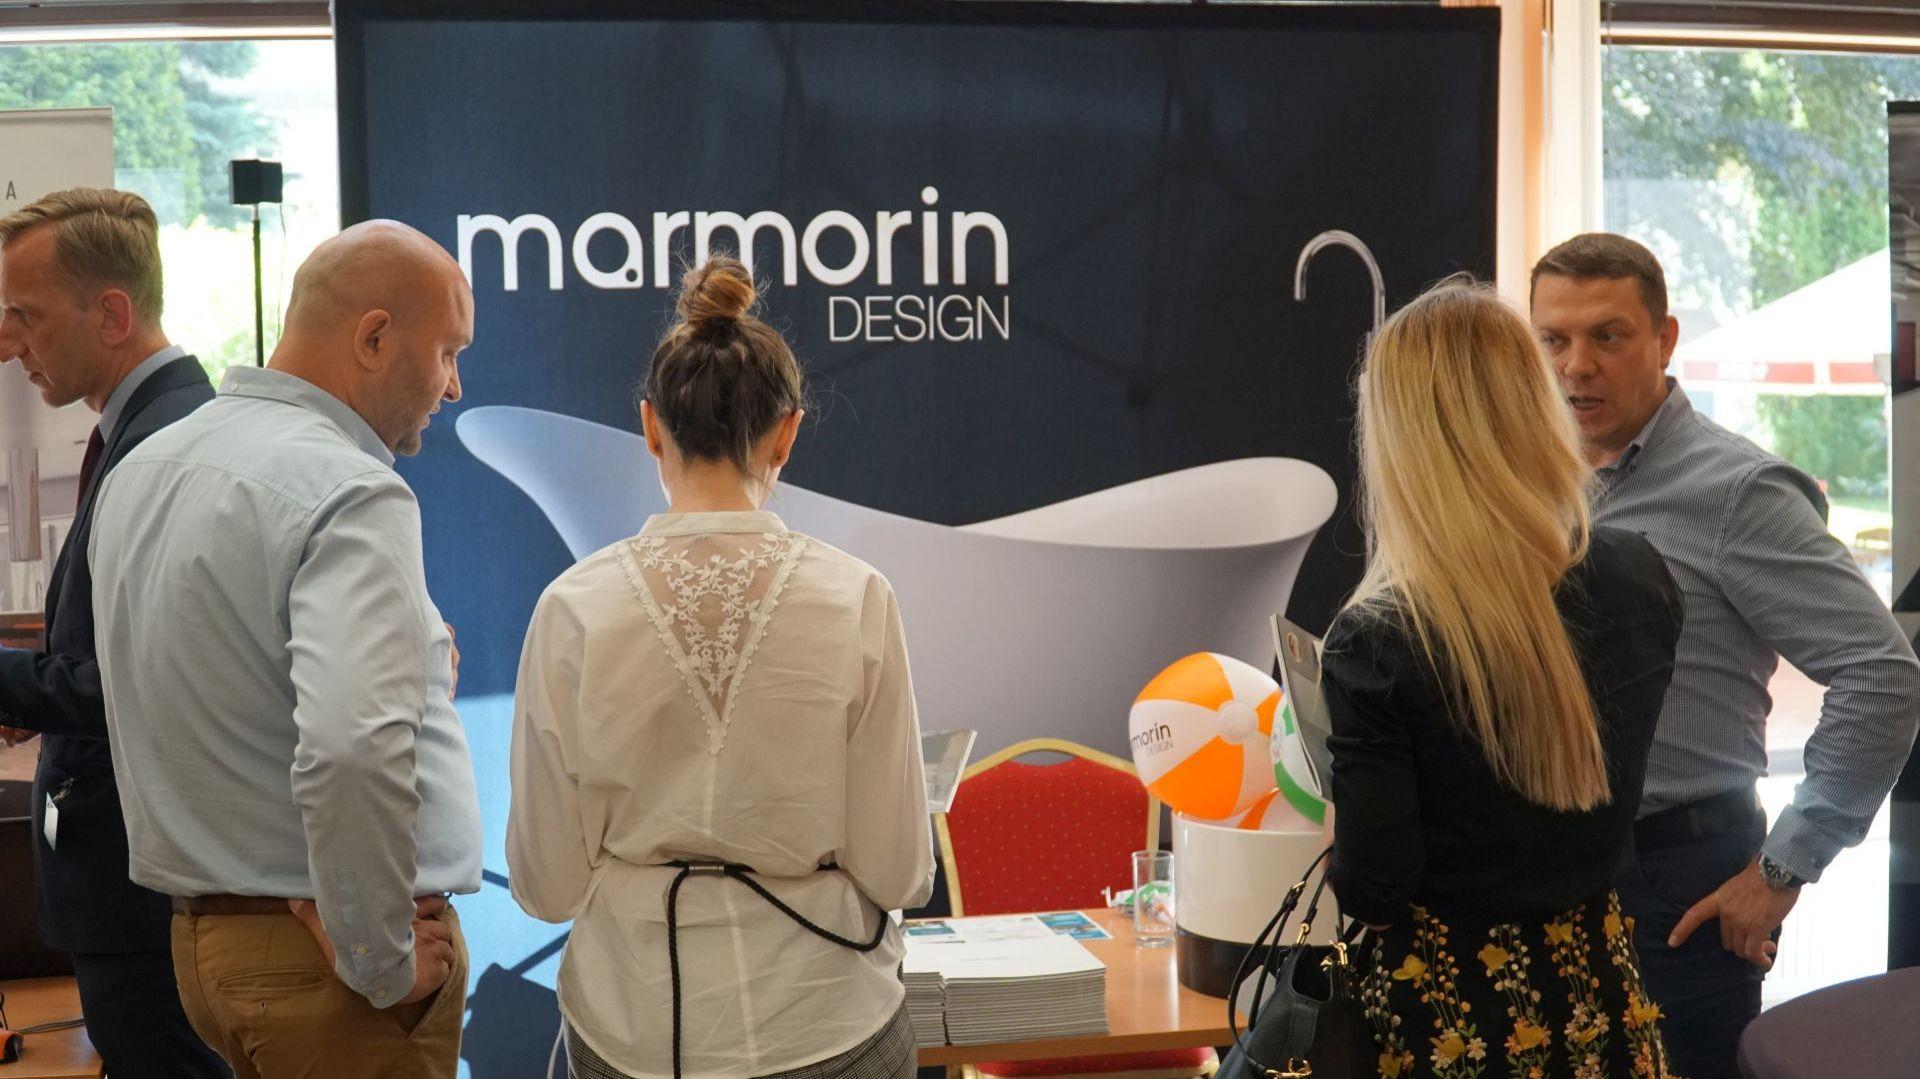 Stoisko Marmorin Design